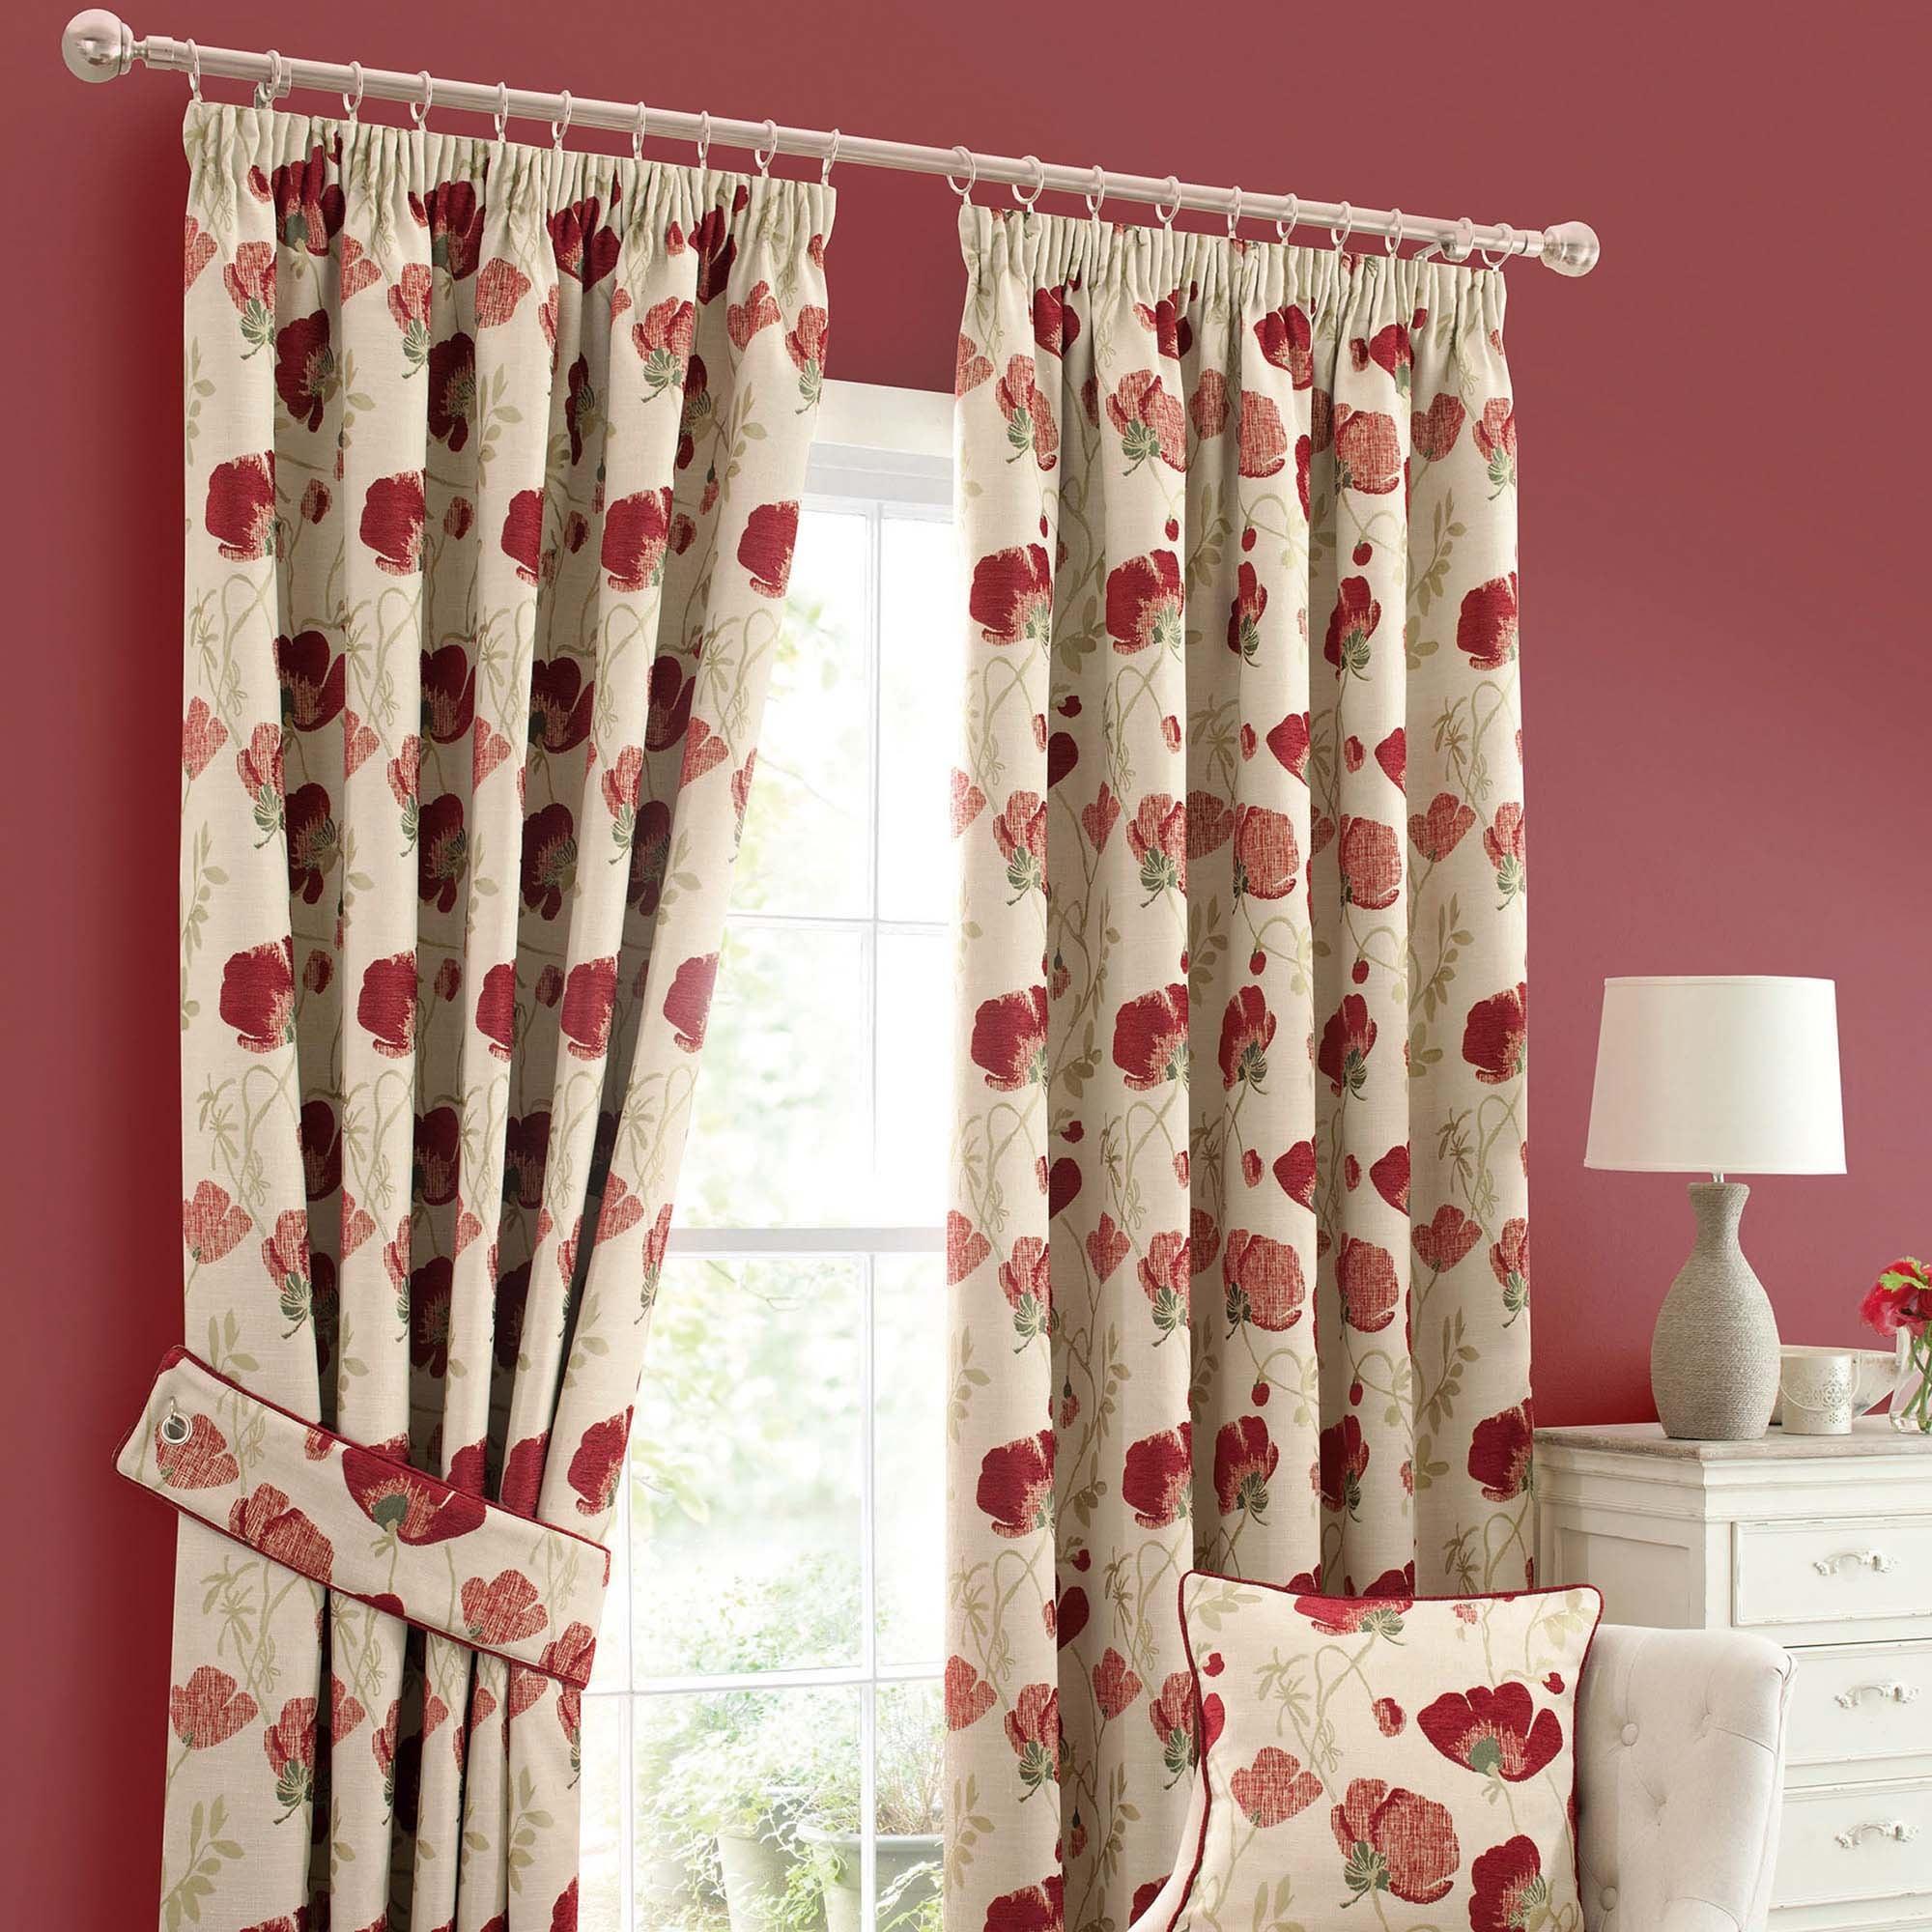 Chenille Curtains | Dunelm